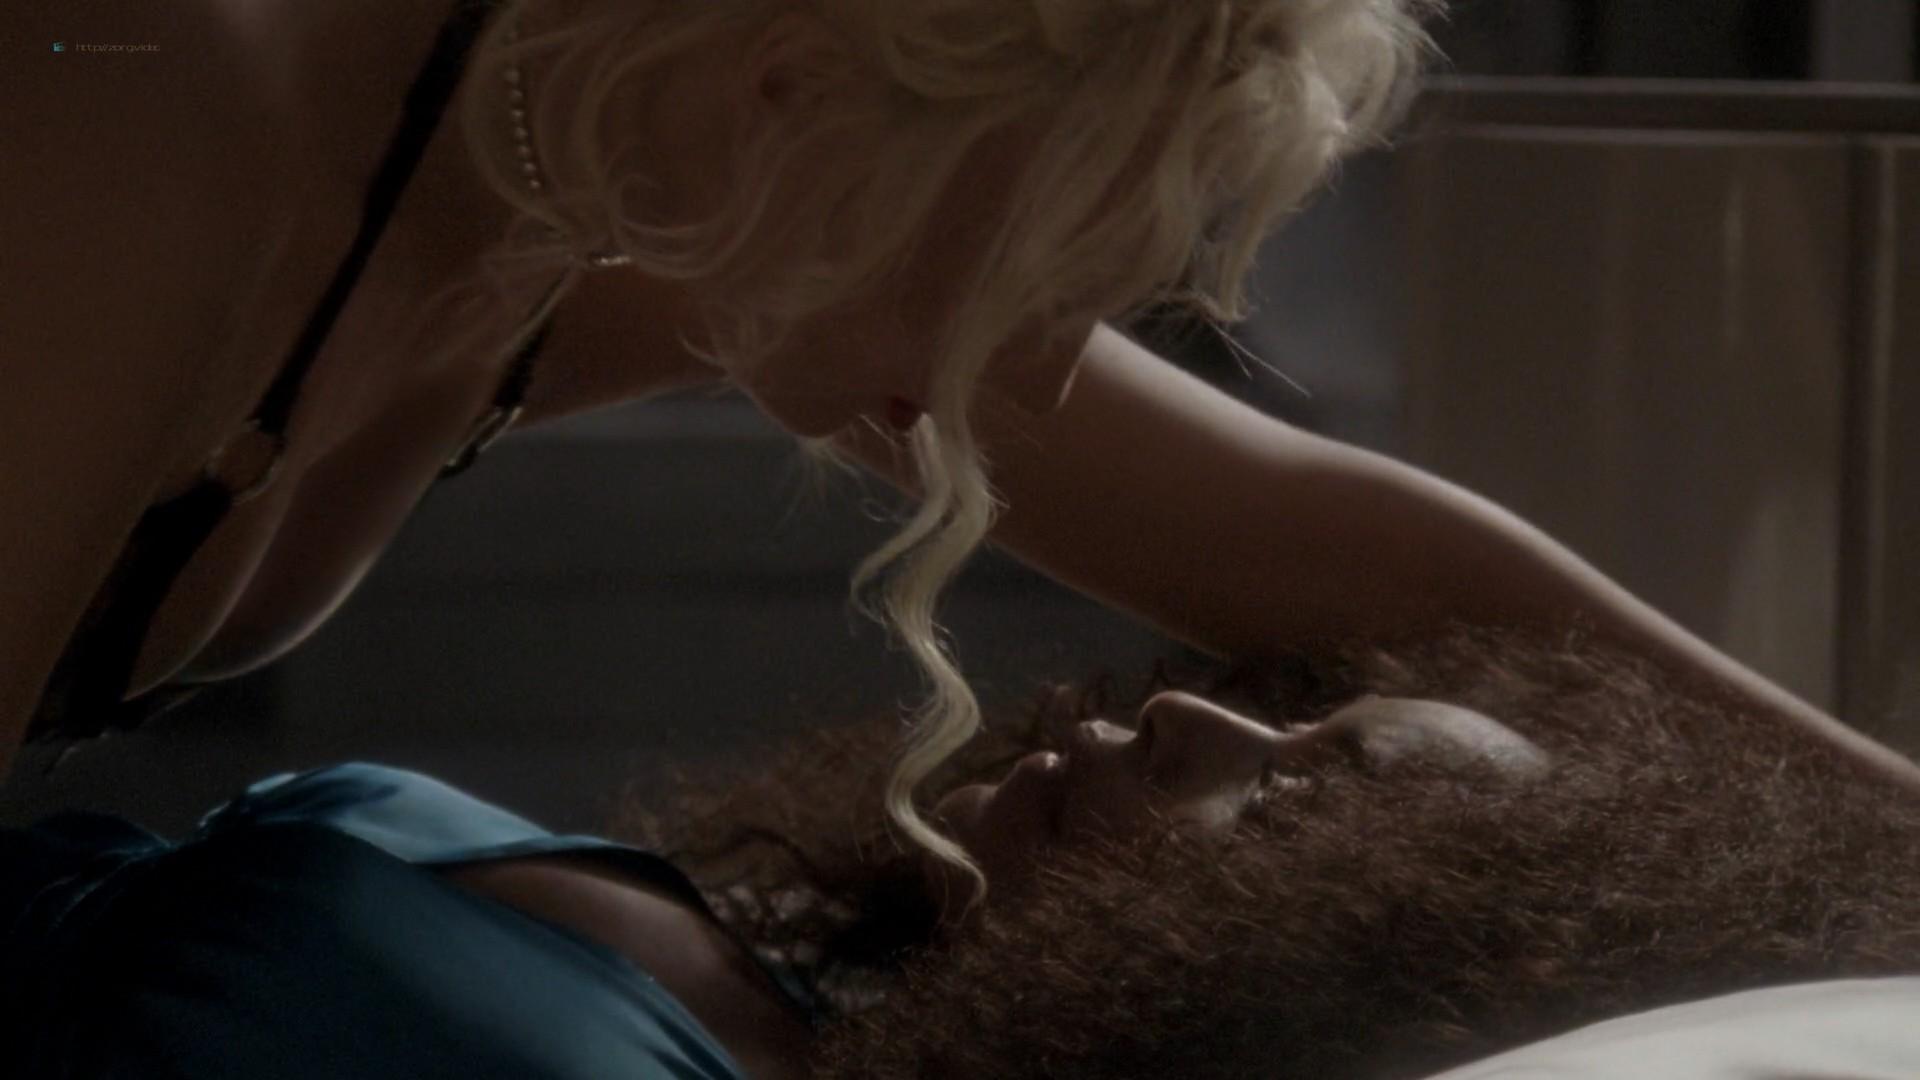 Lady Gaga and Angela Bassett hot lesbian sex - American Horror Story (2015) s5e3 HD 1080p (10)